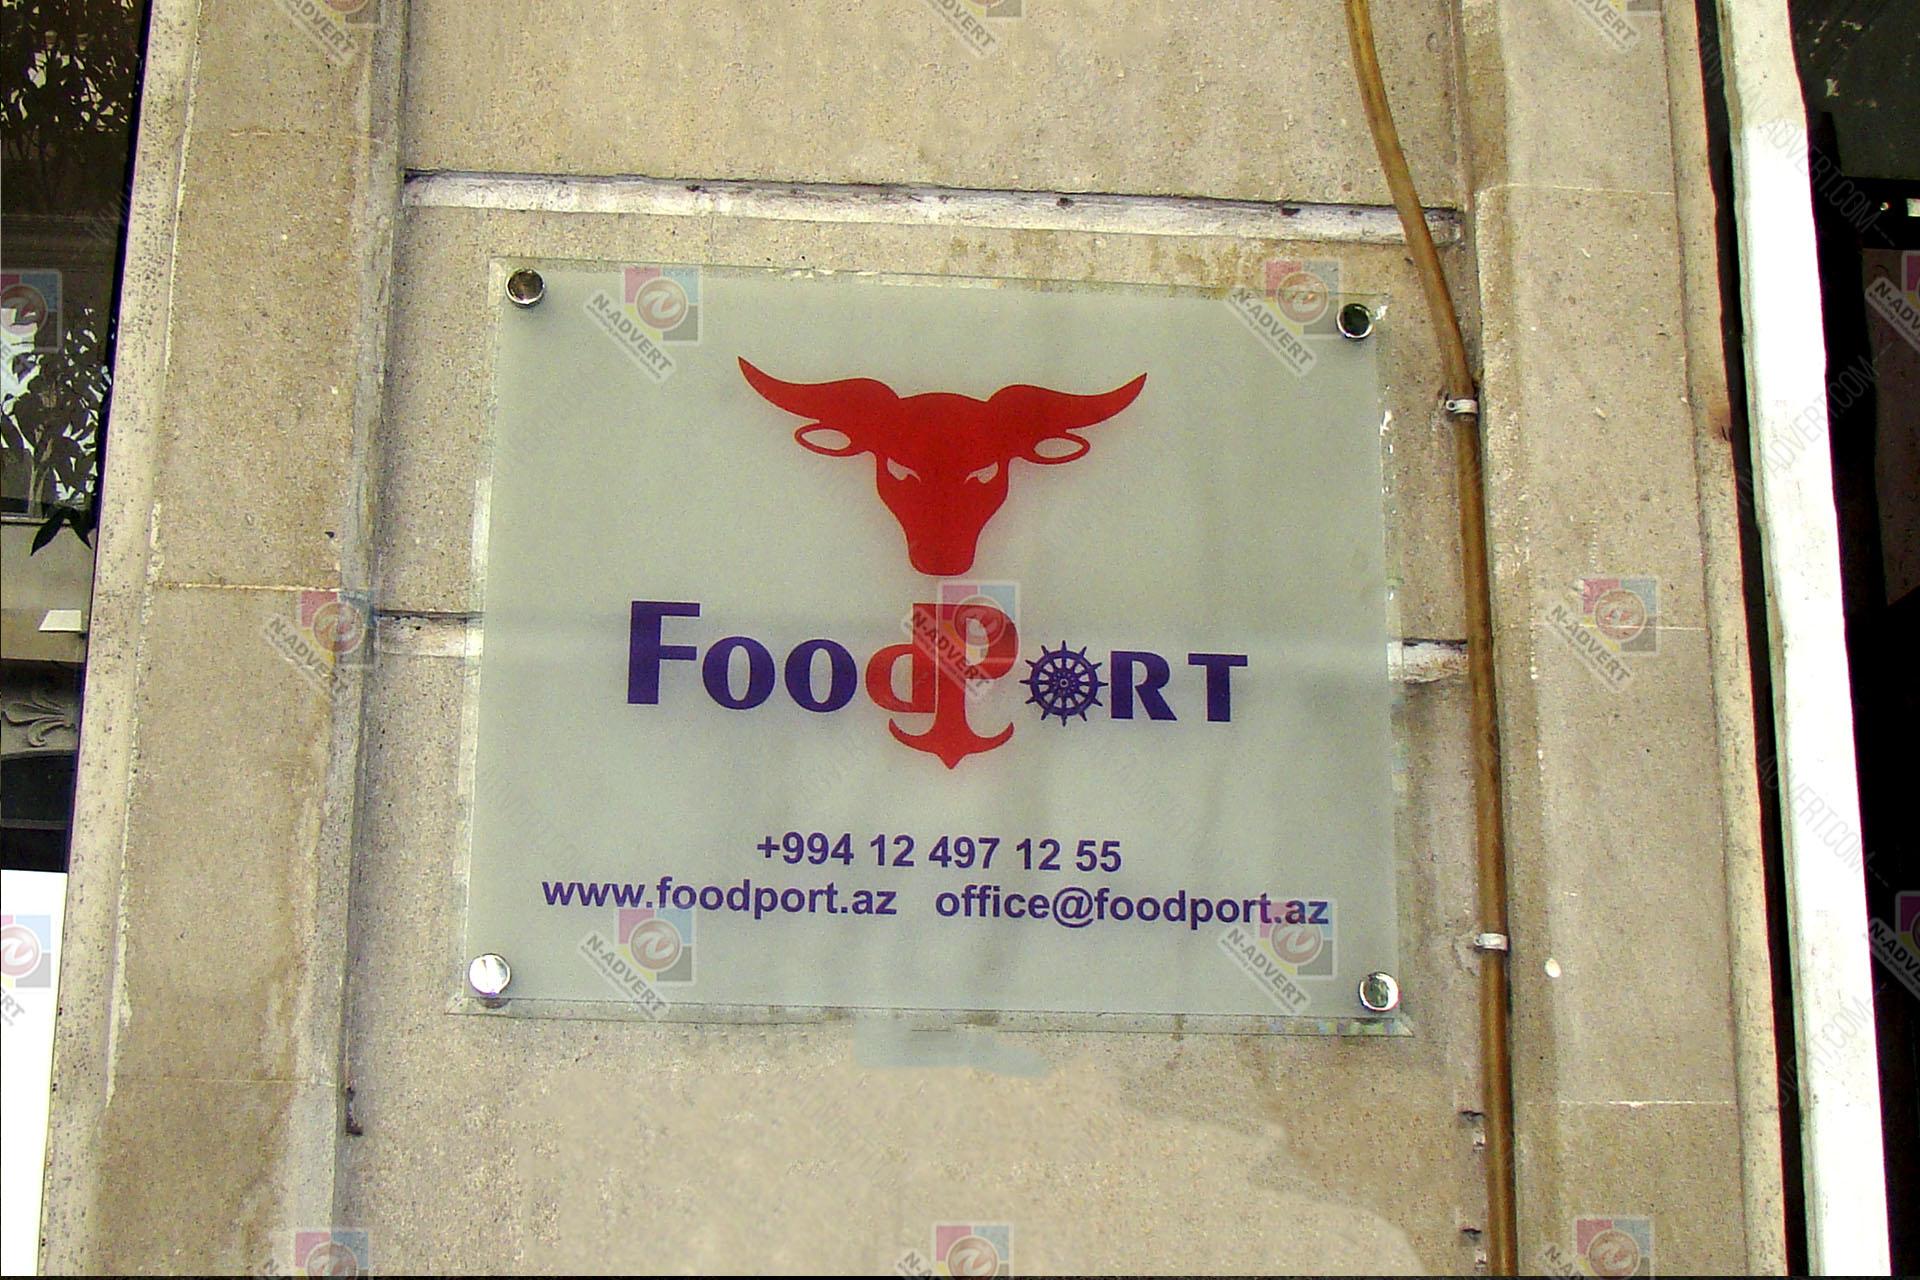 Food port qapi 1920x1280